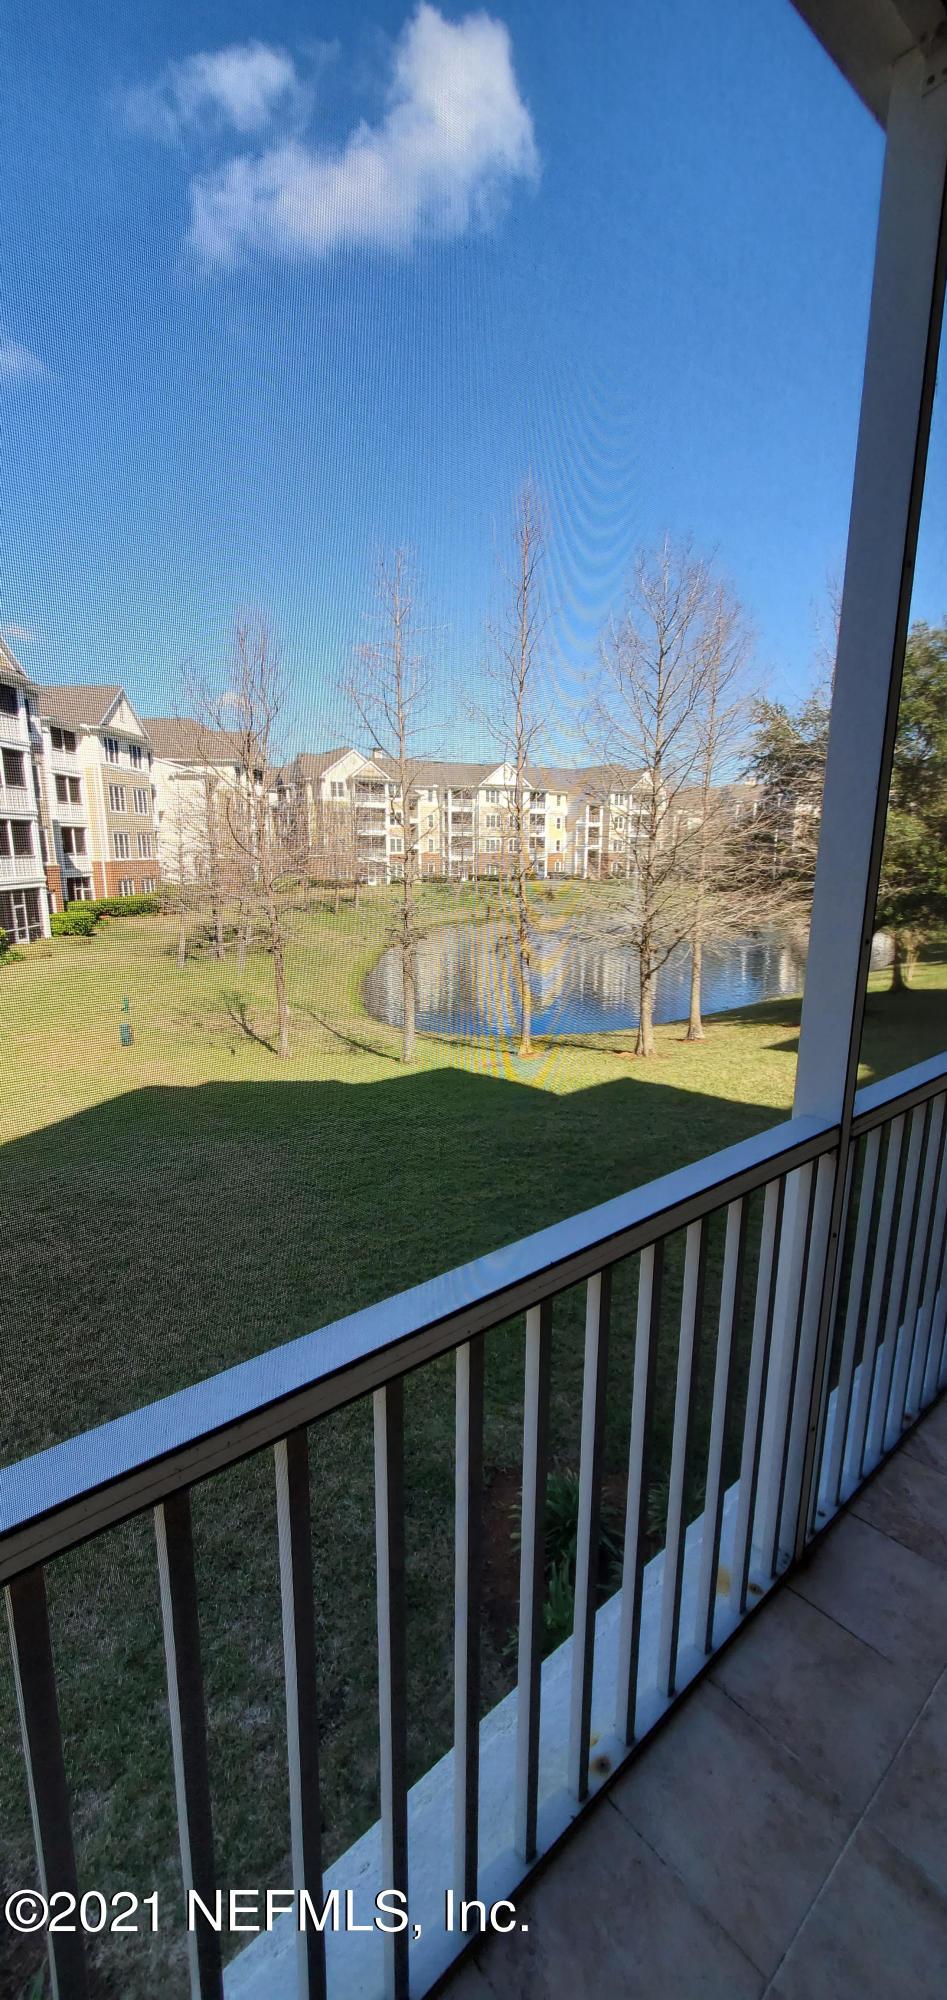 13364 BEACH BLVD, JACKSONVILLE, Florida 32224, 3 Bedrooms Bedrooms, ,2 BathroomsBathrooms,Condominium,For Sale,13364 BEACH BLVD,1103417